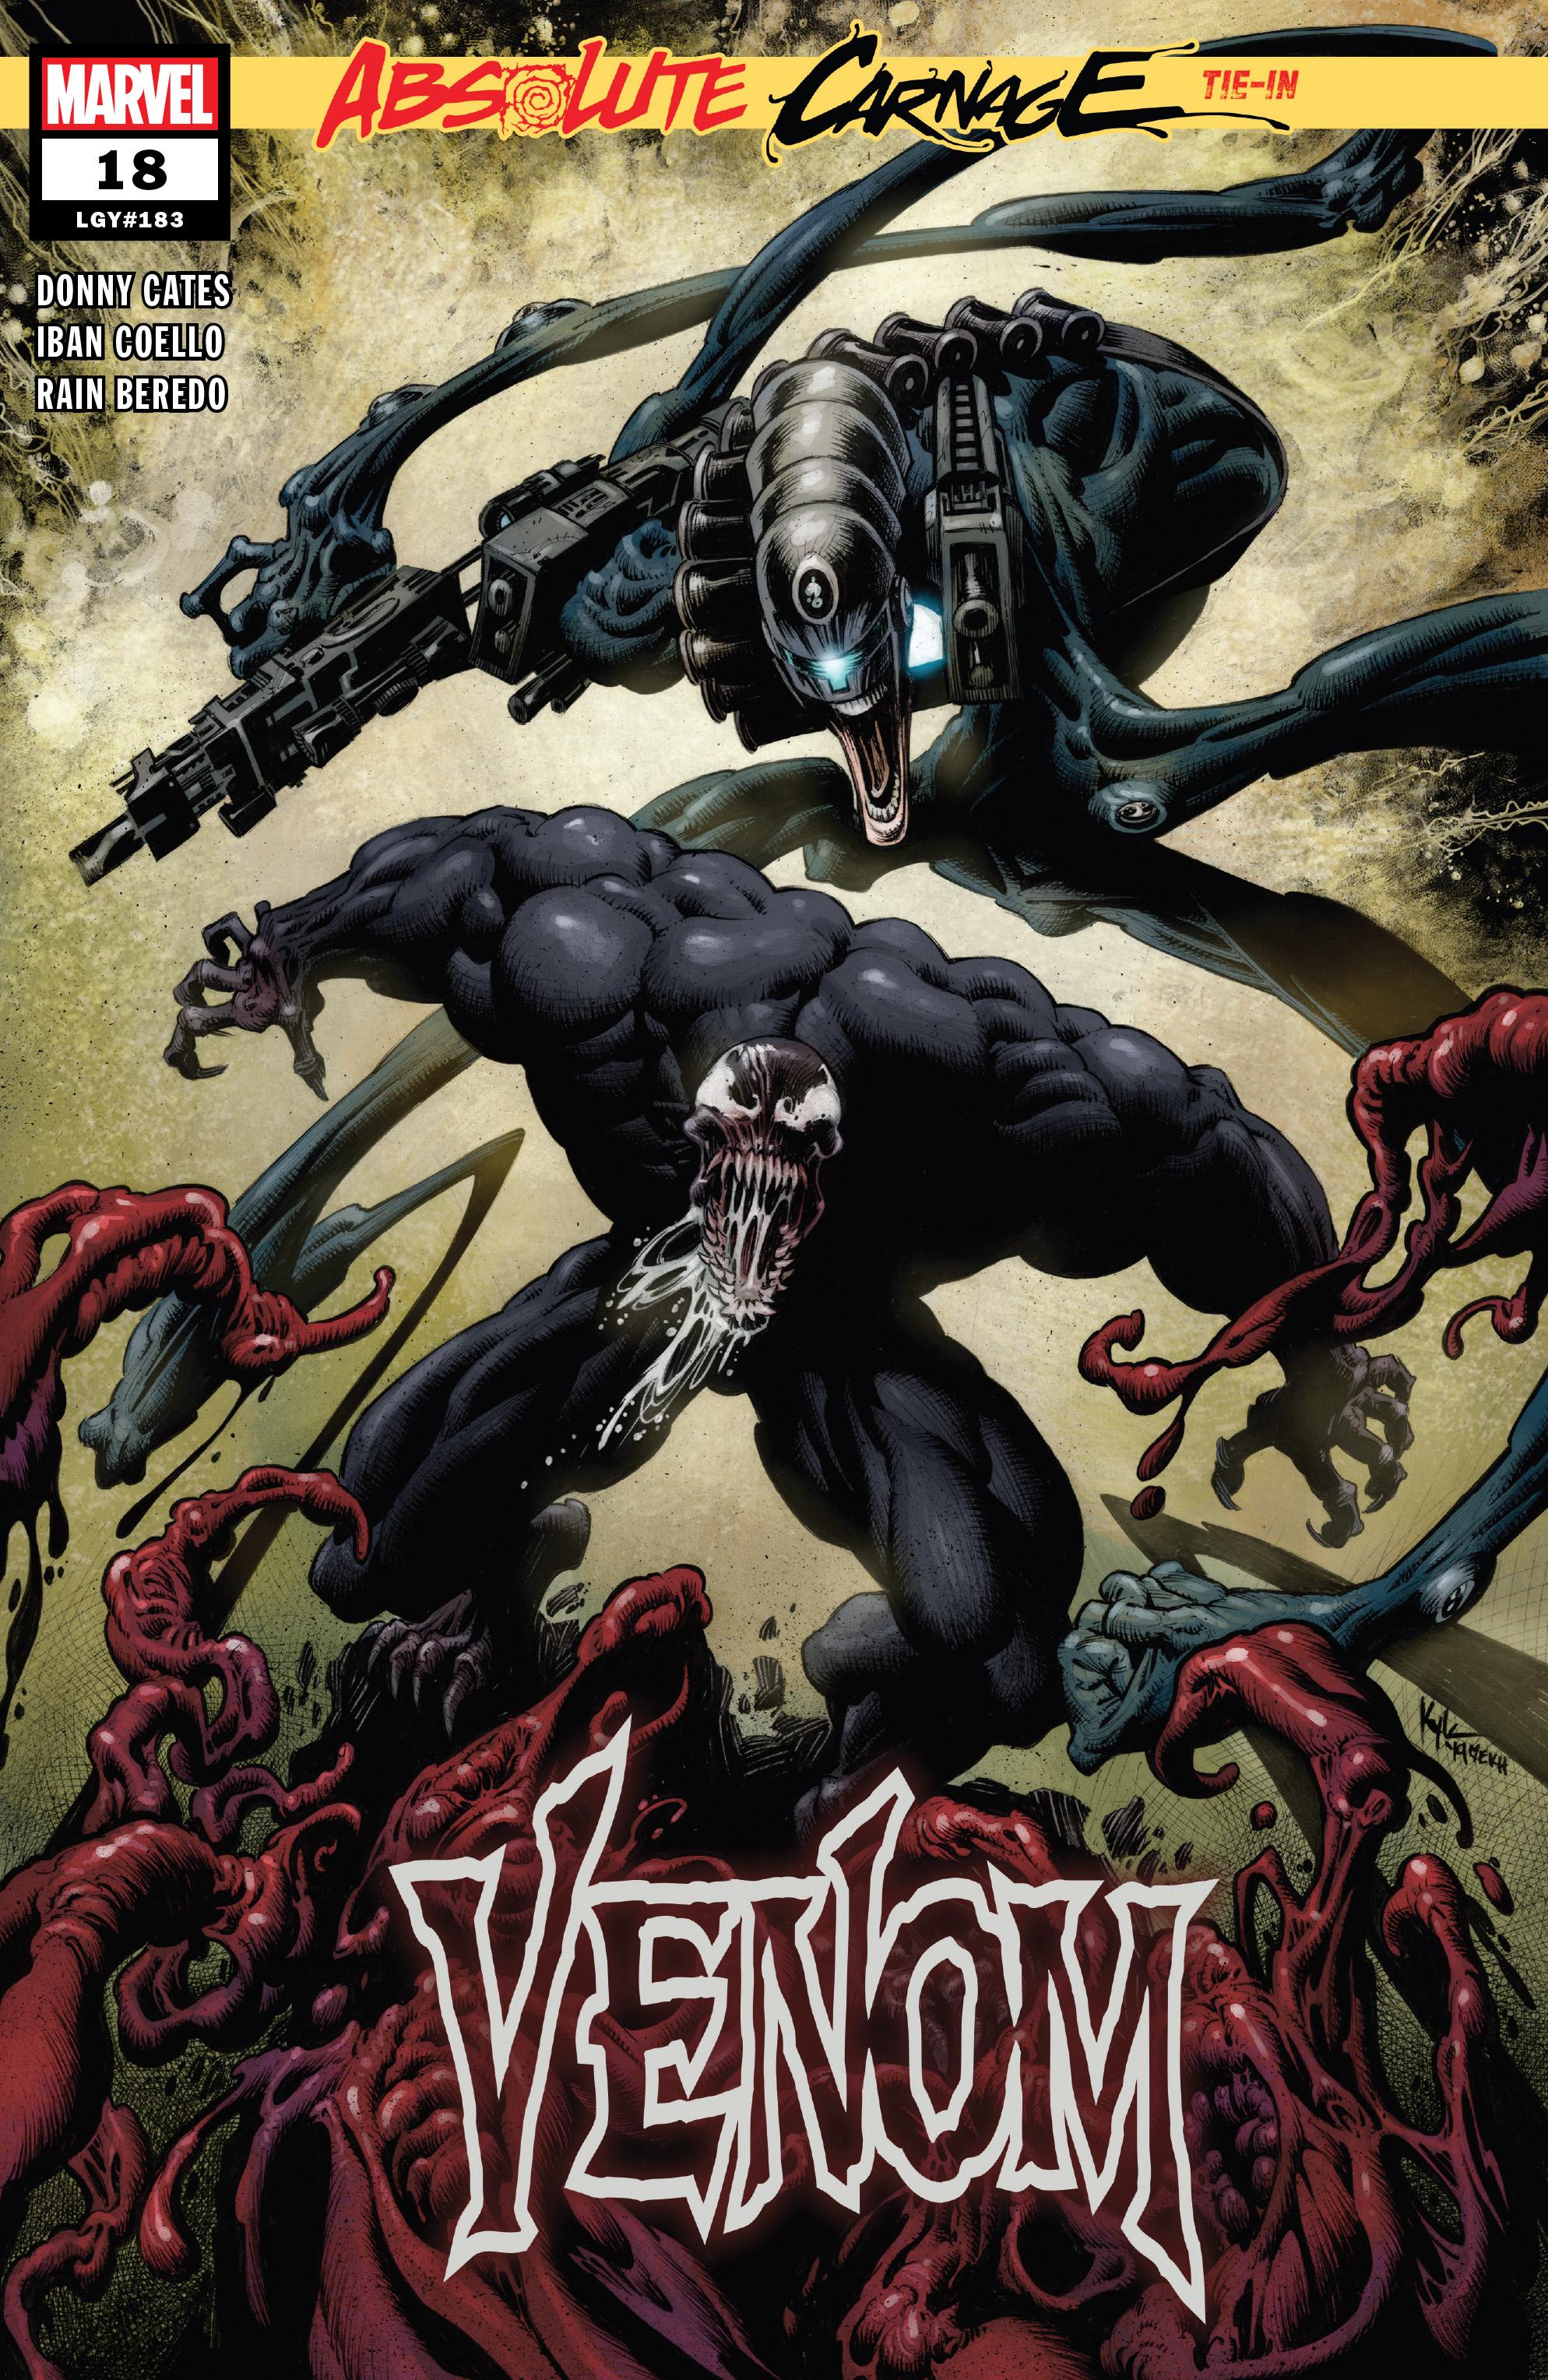 Venom (2018-) Chapter 18 - Page 1